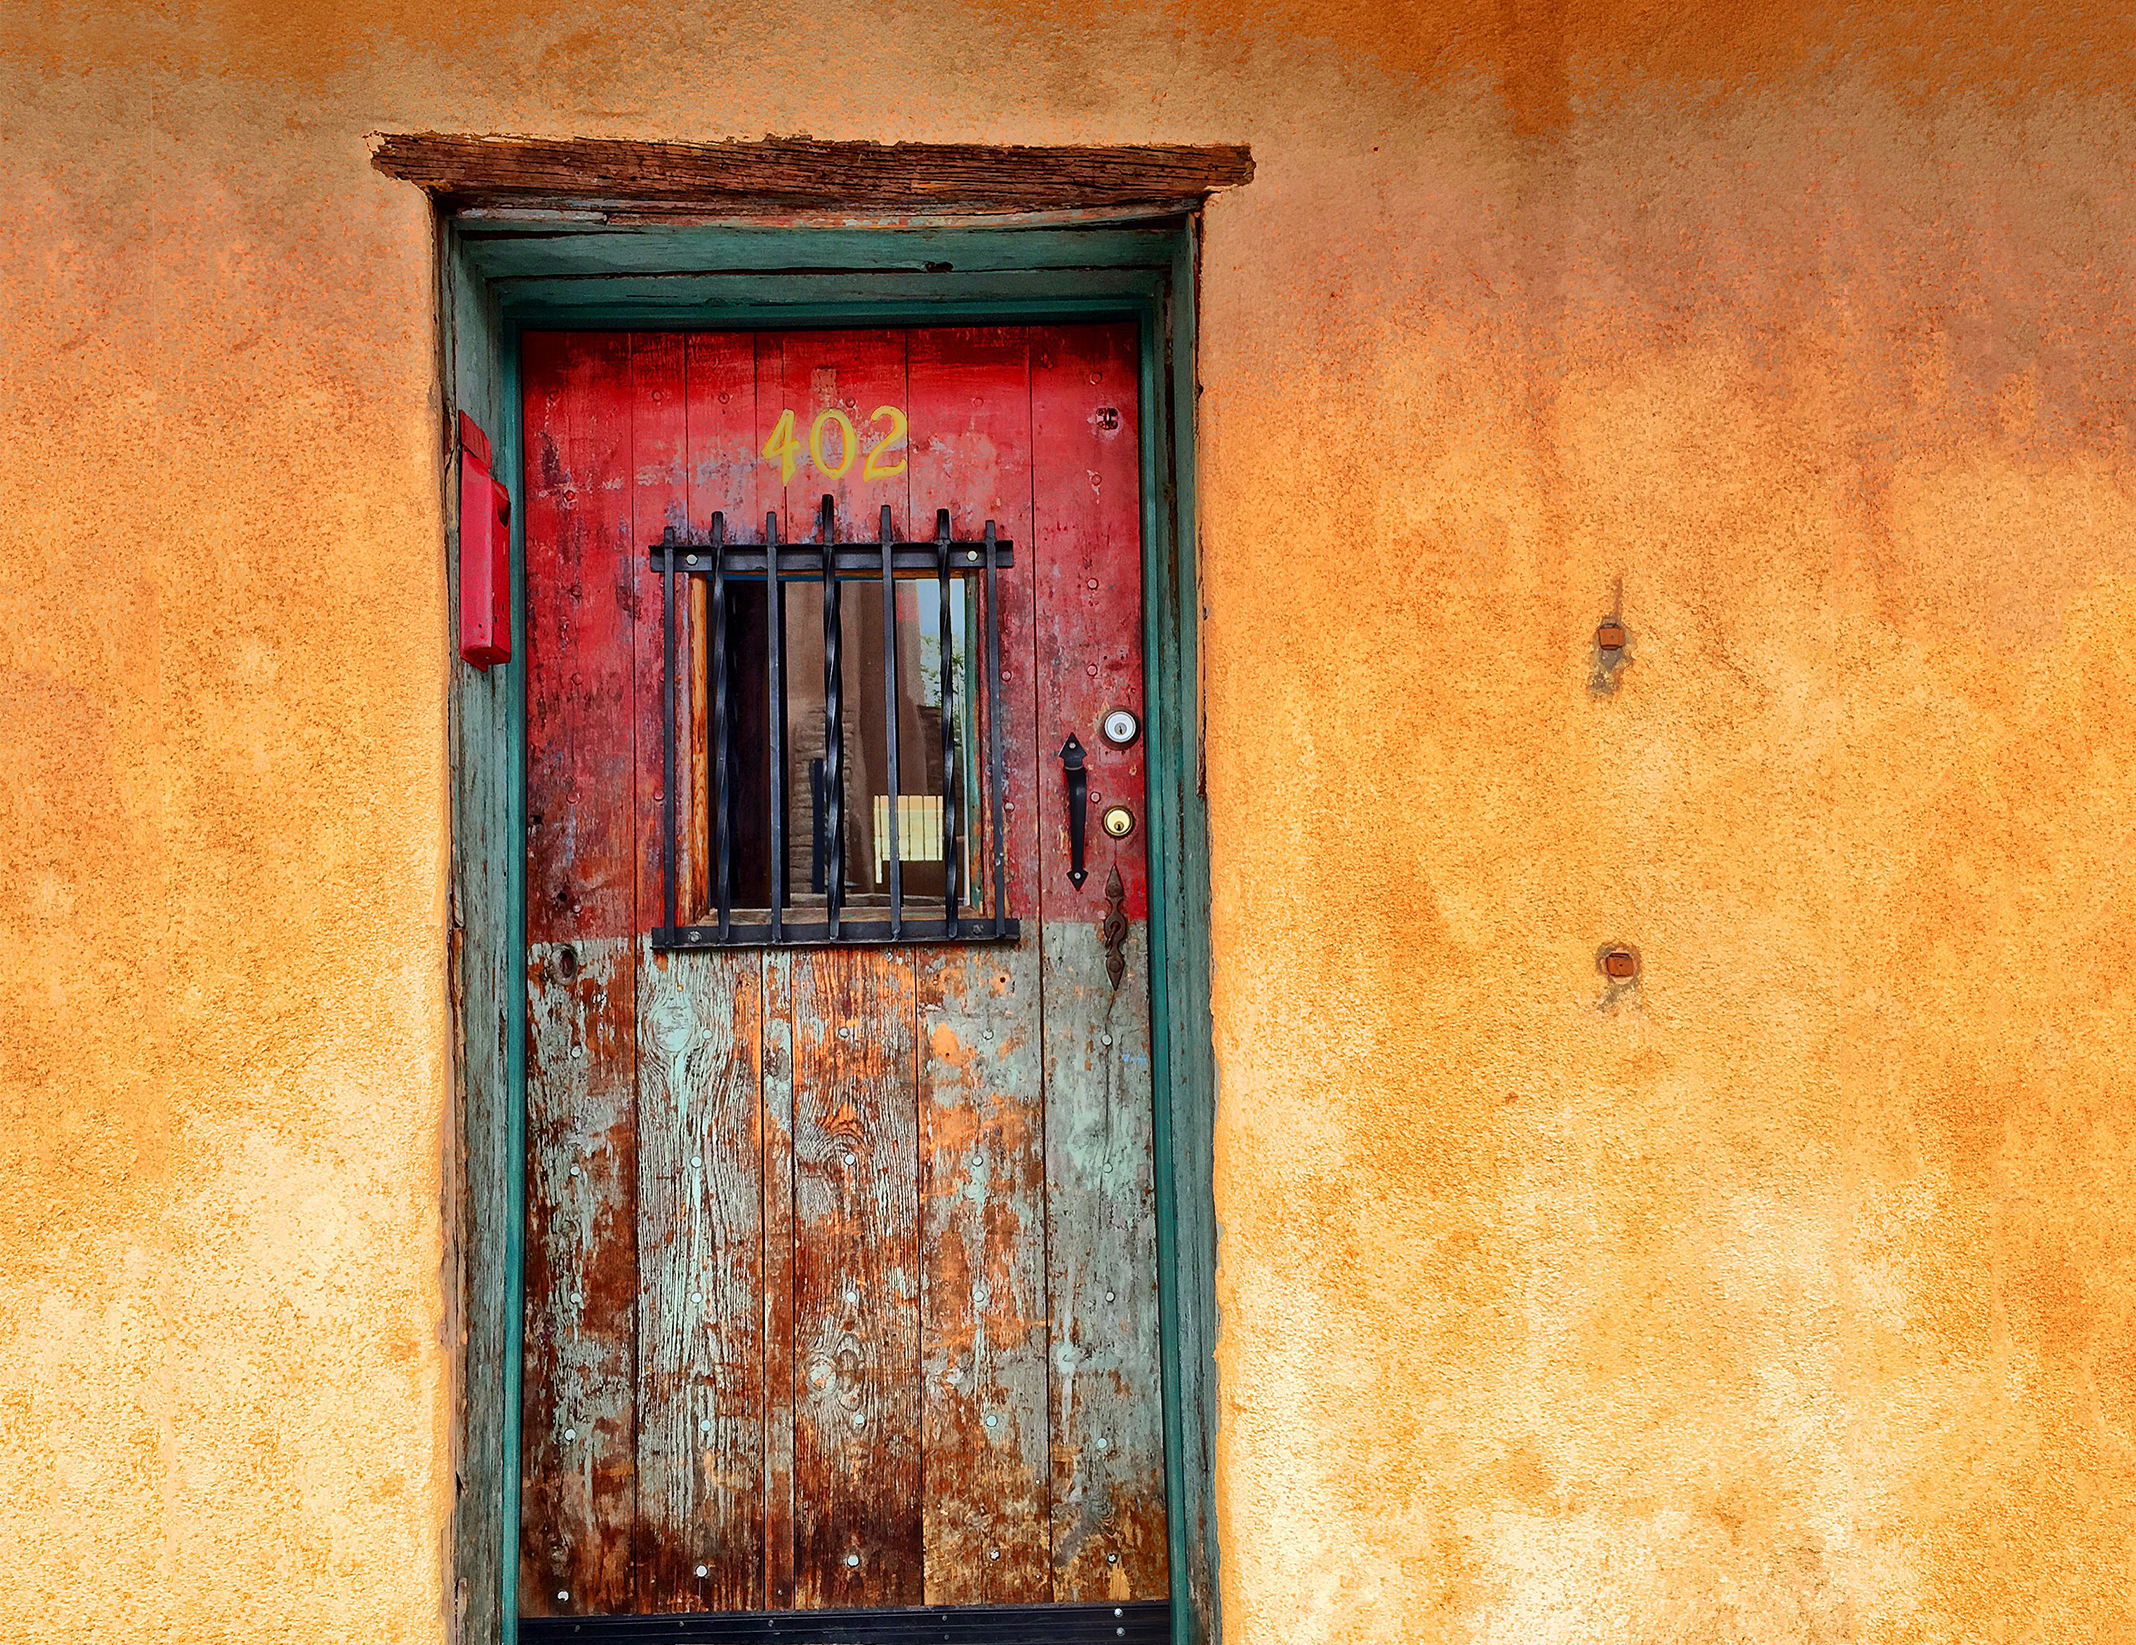 Santa Fe door2.jpg